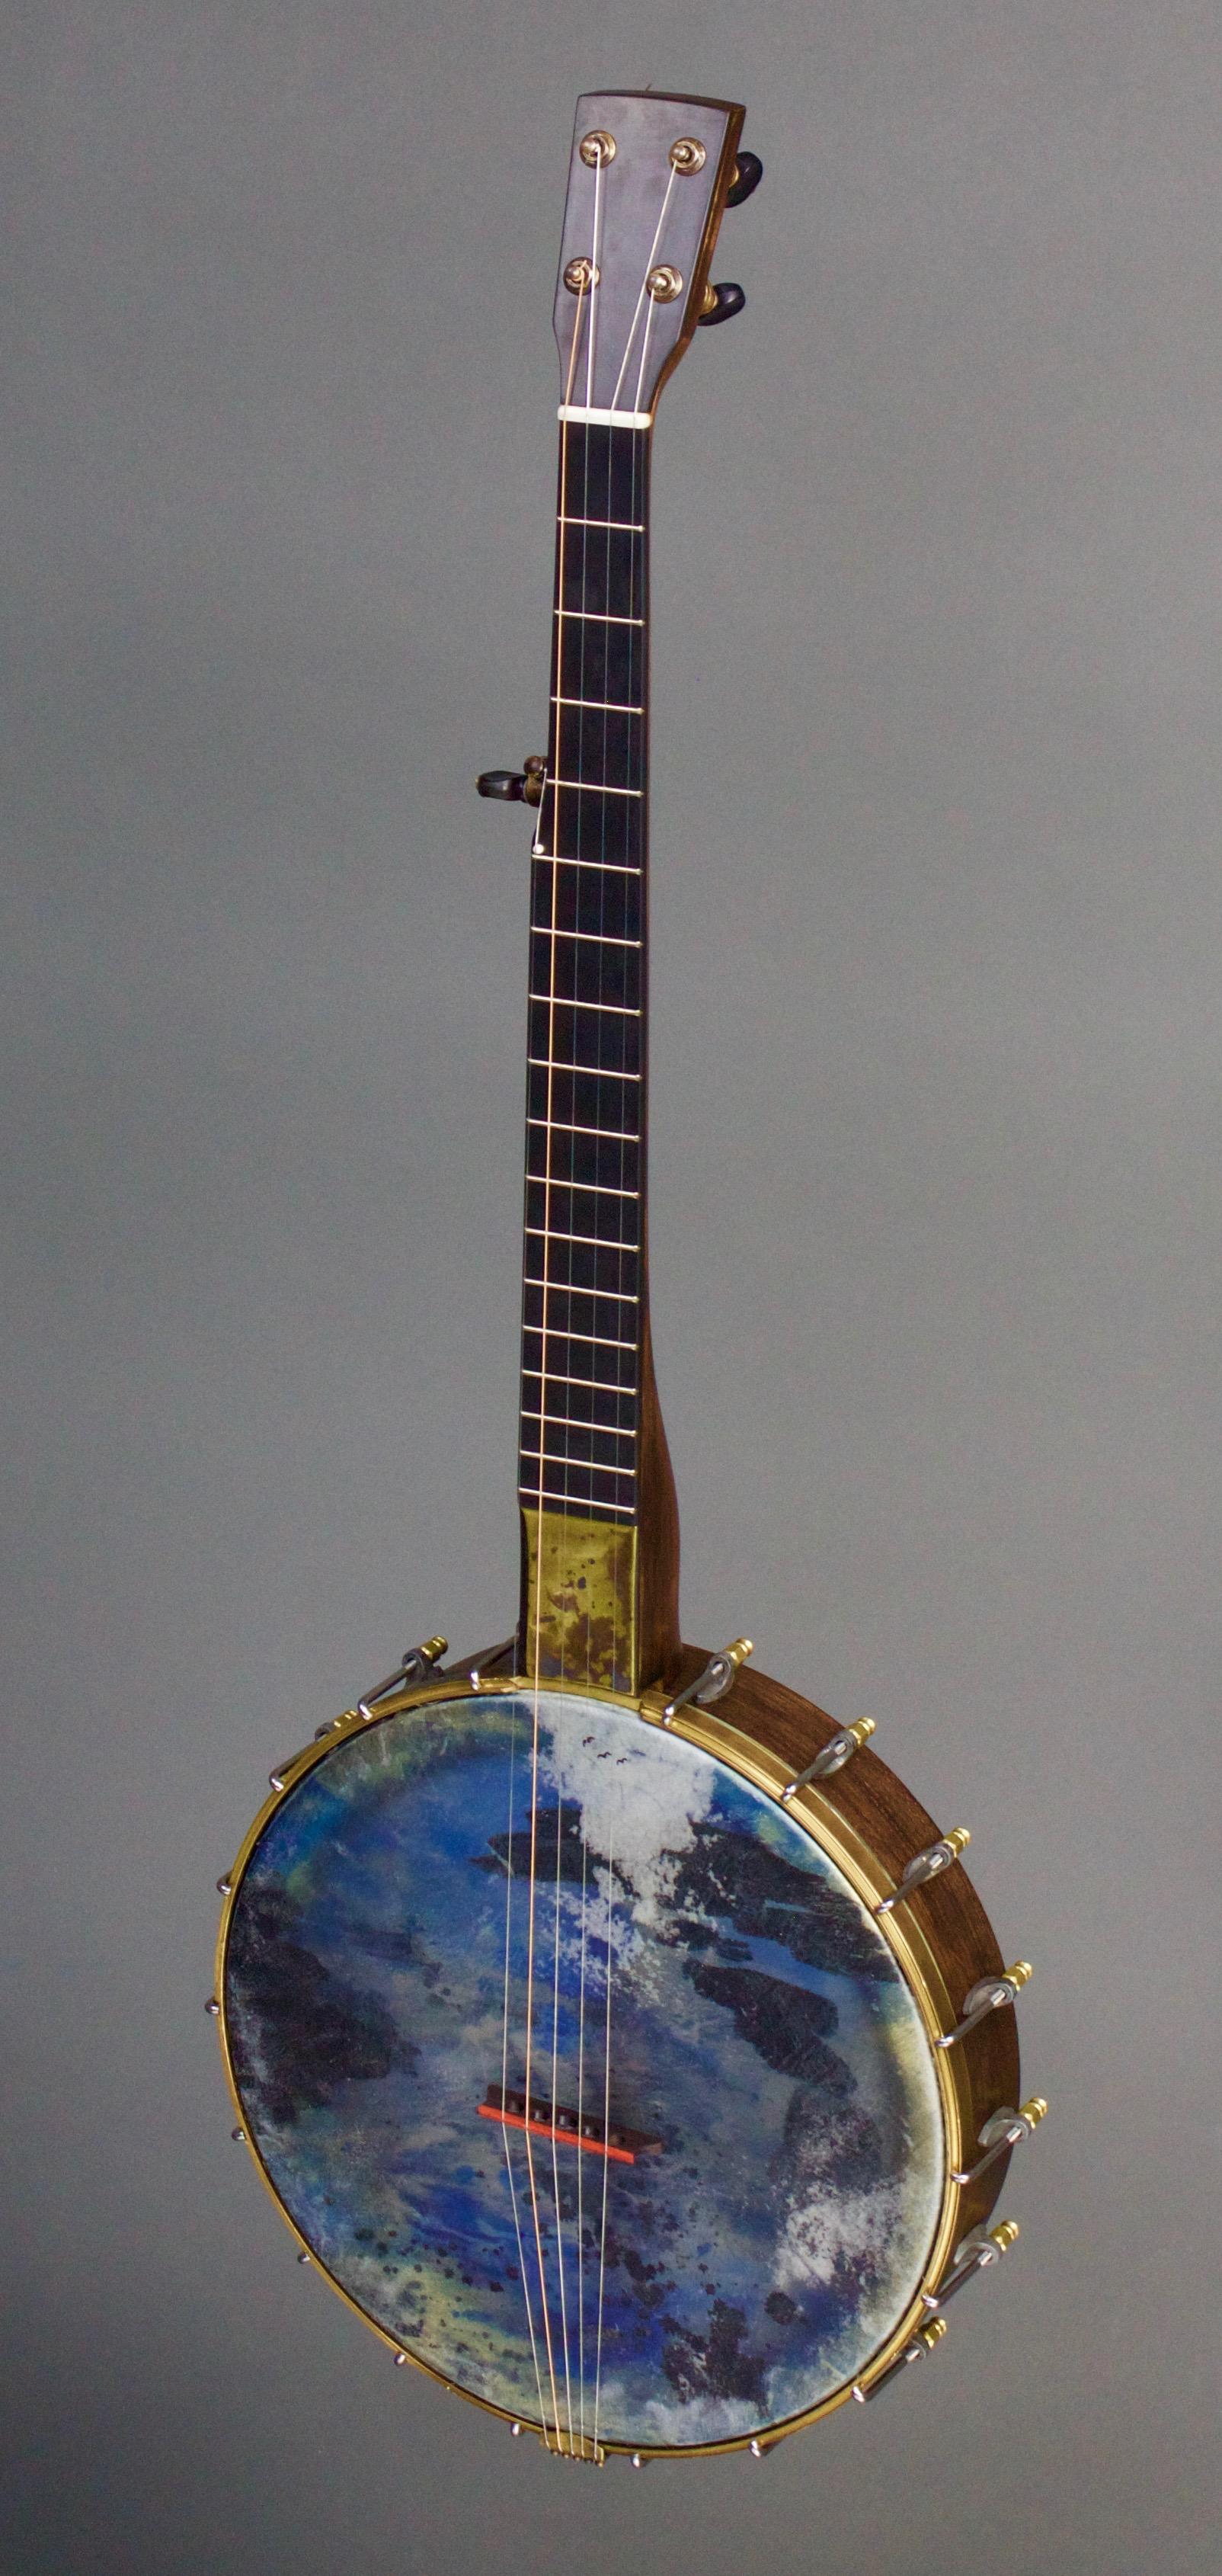 Impressionistic Banjo